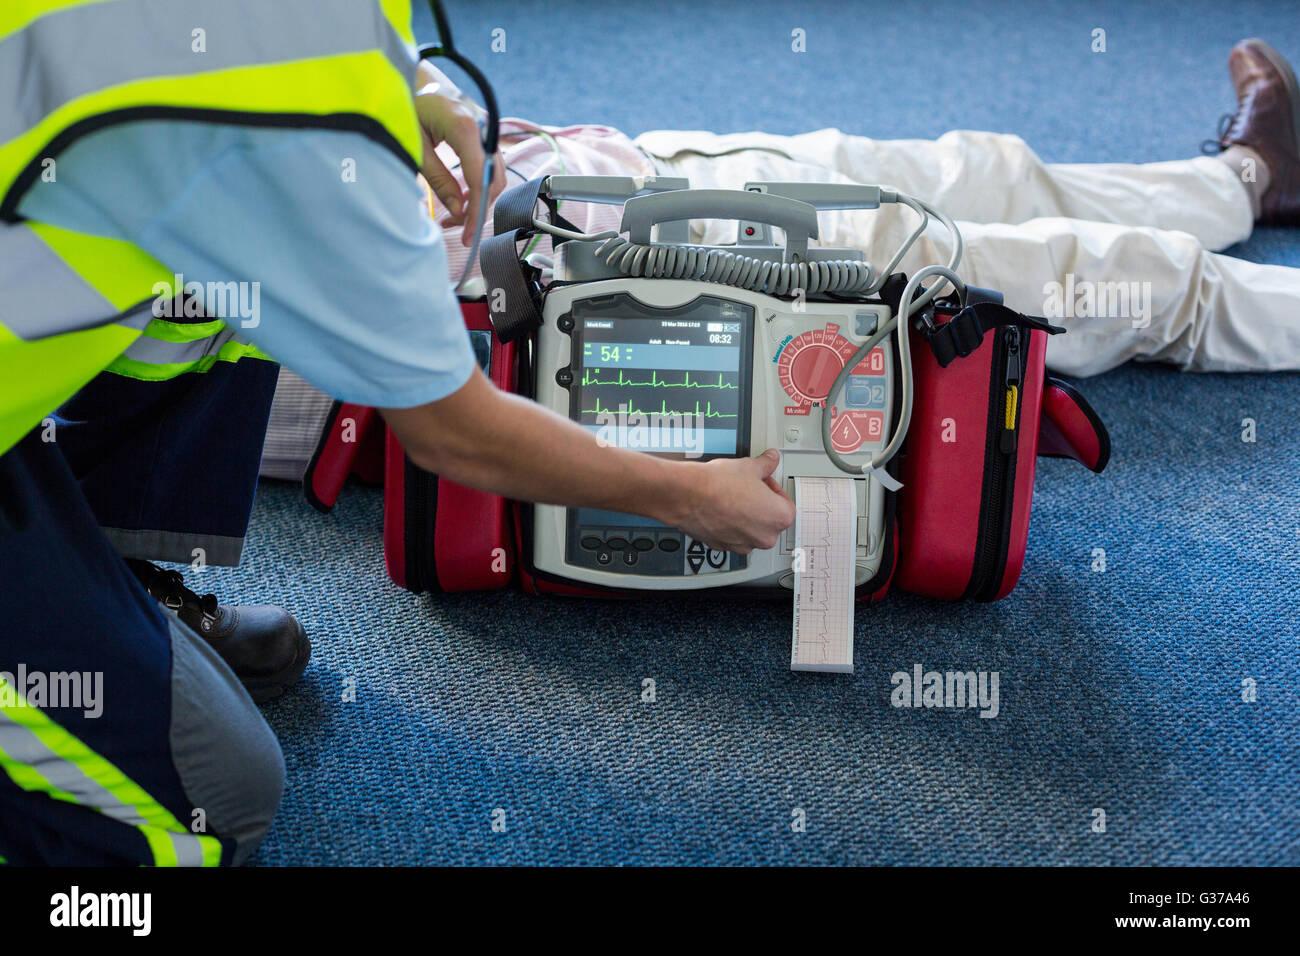 Paramedic using an external defibrillator during cardiopulmonary resuscitation - Stock Image